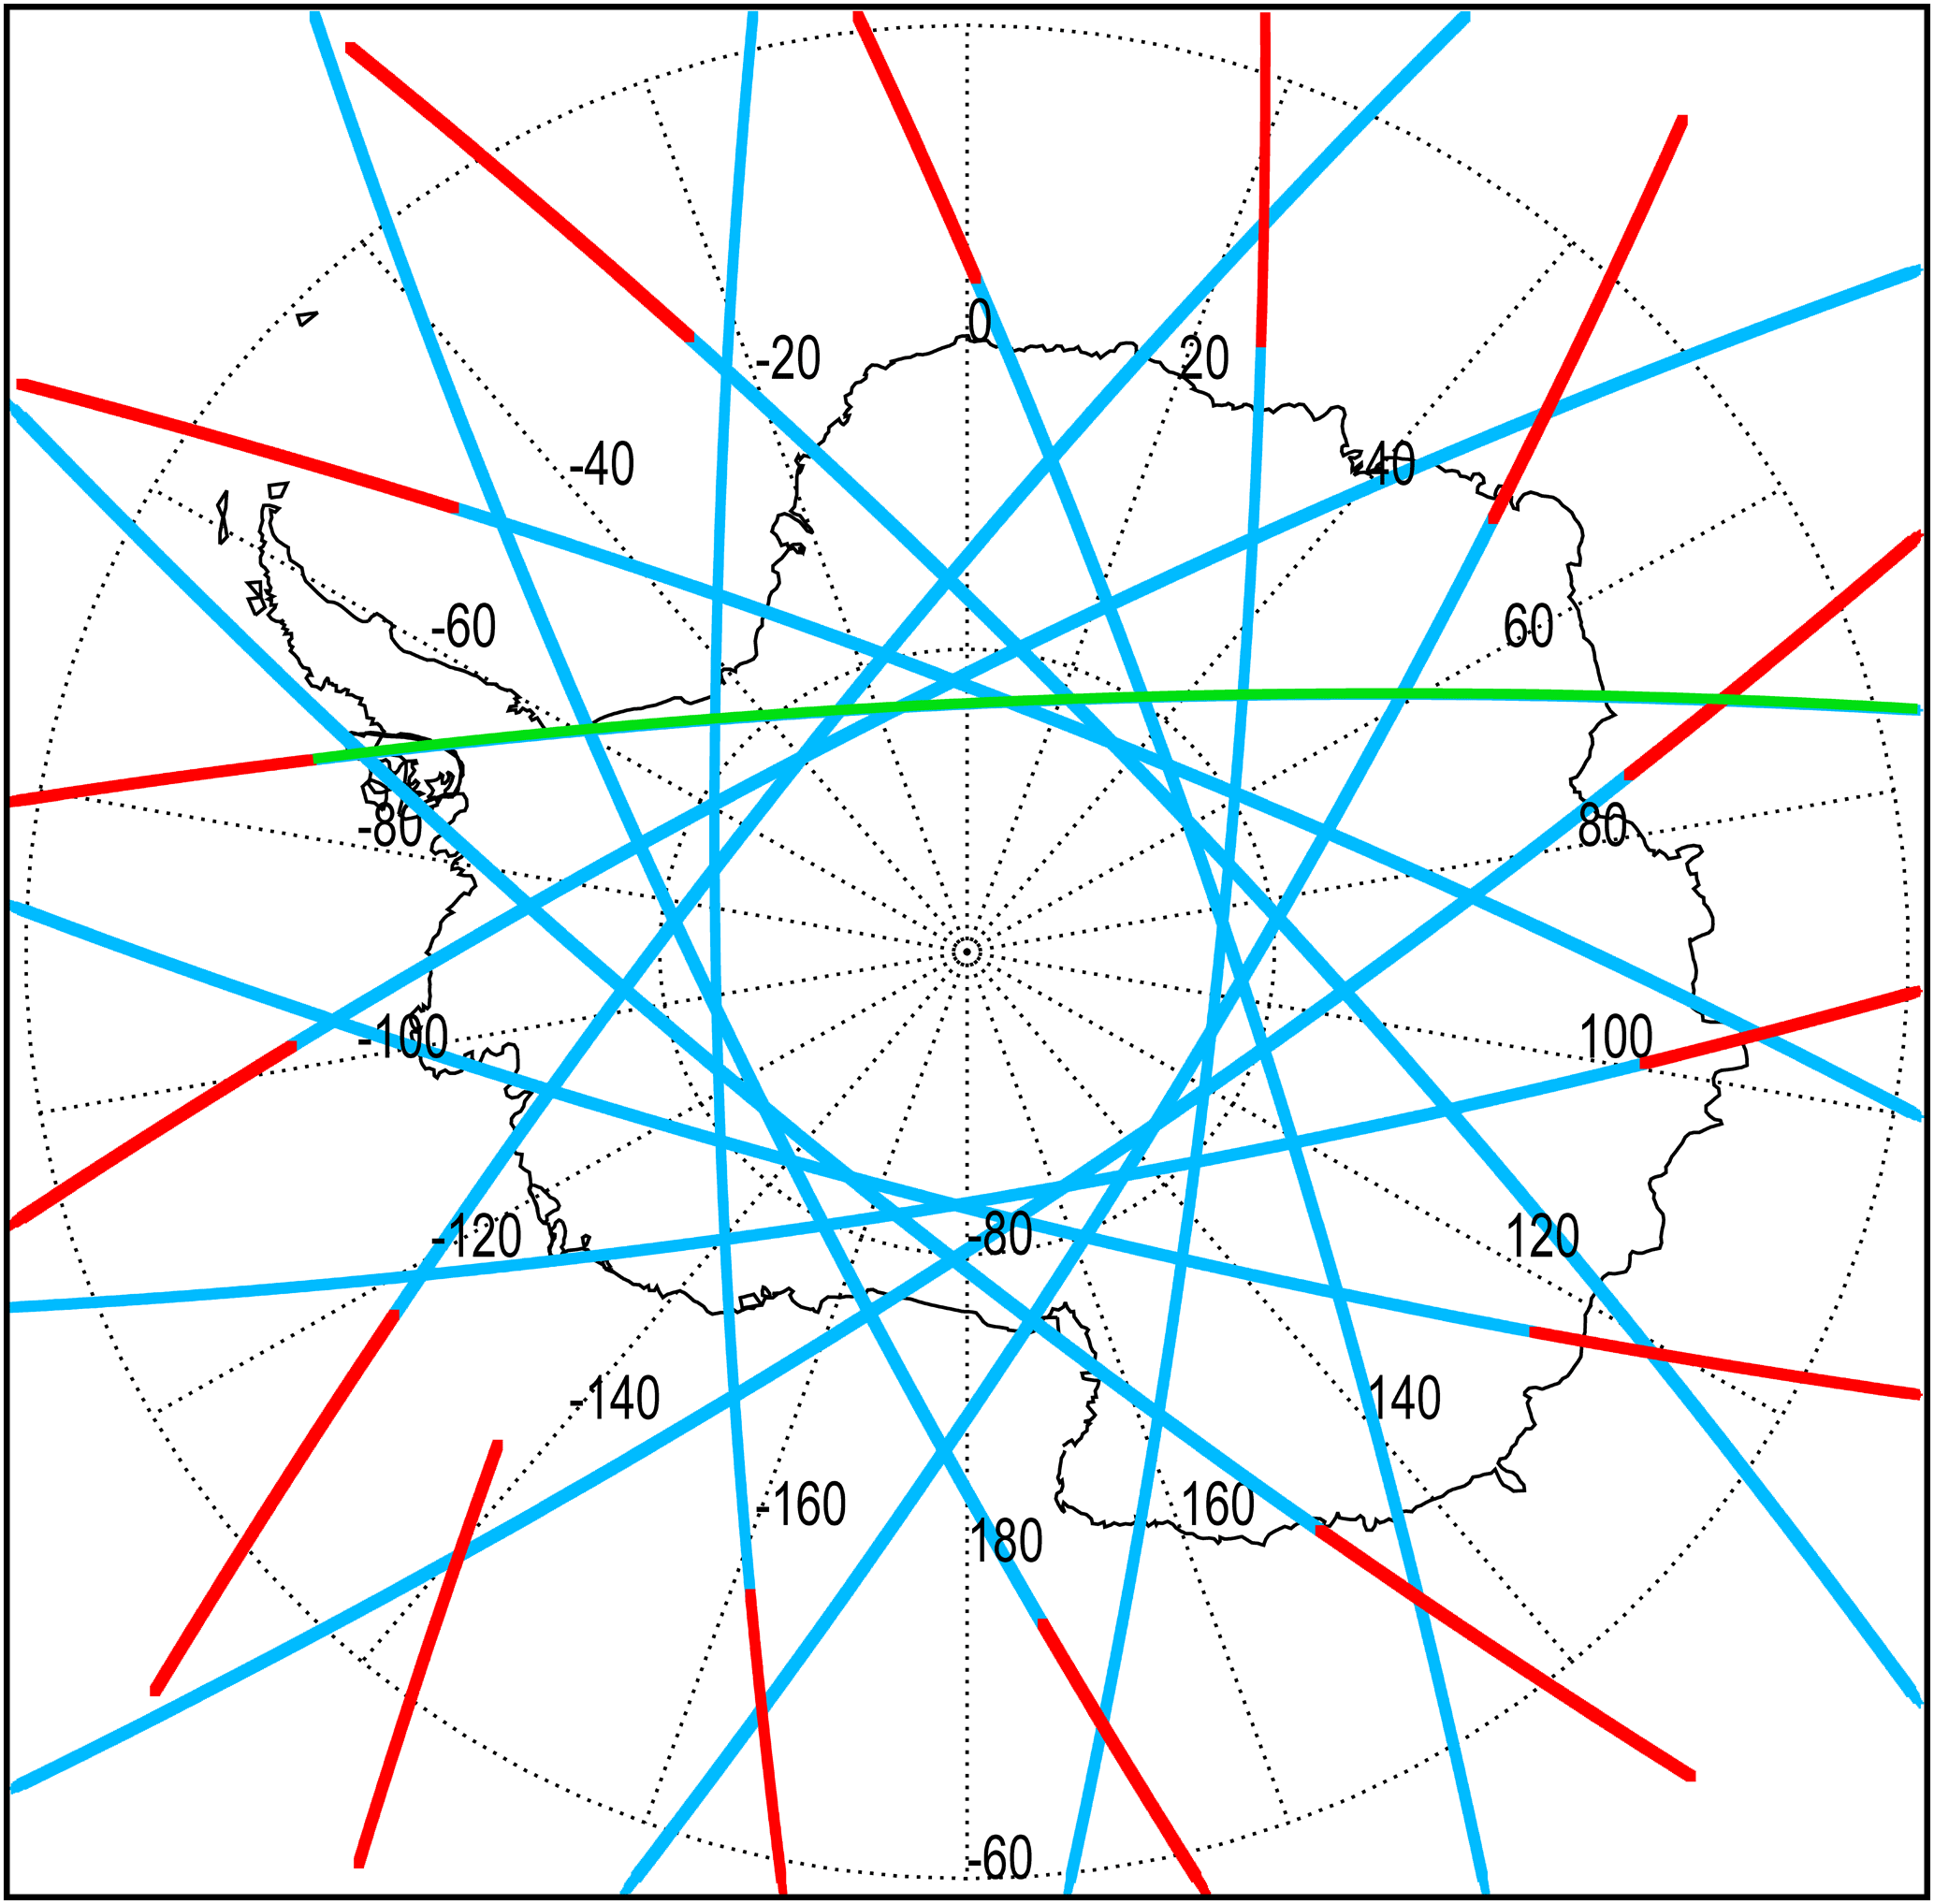 ACP - Polar stratospheric cloud climatology based on CALIPSO